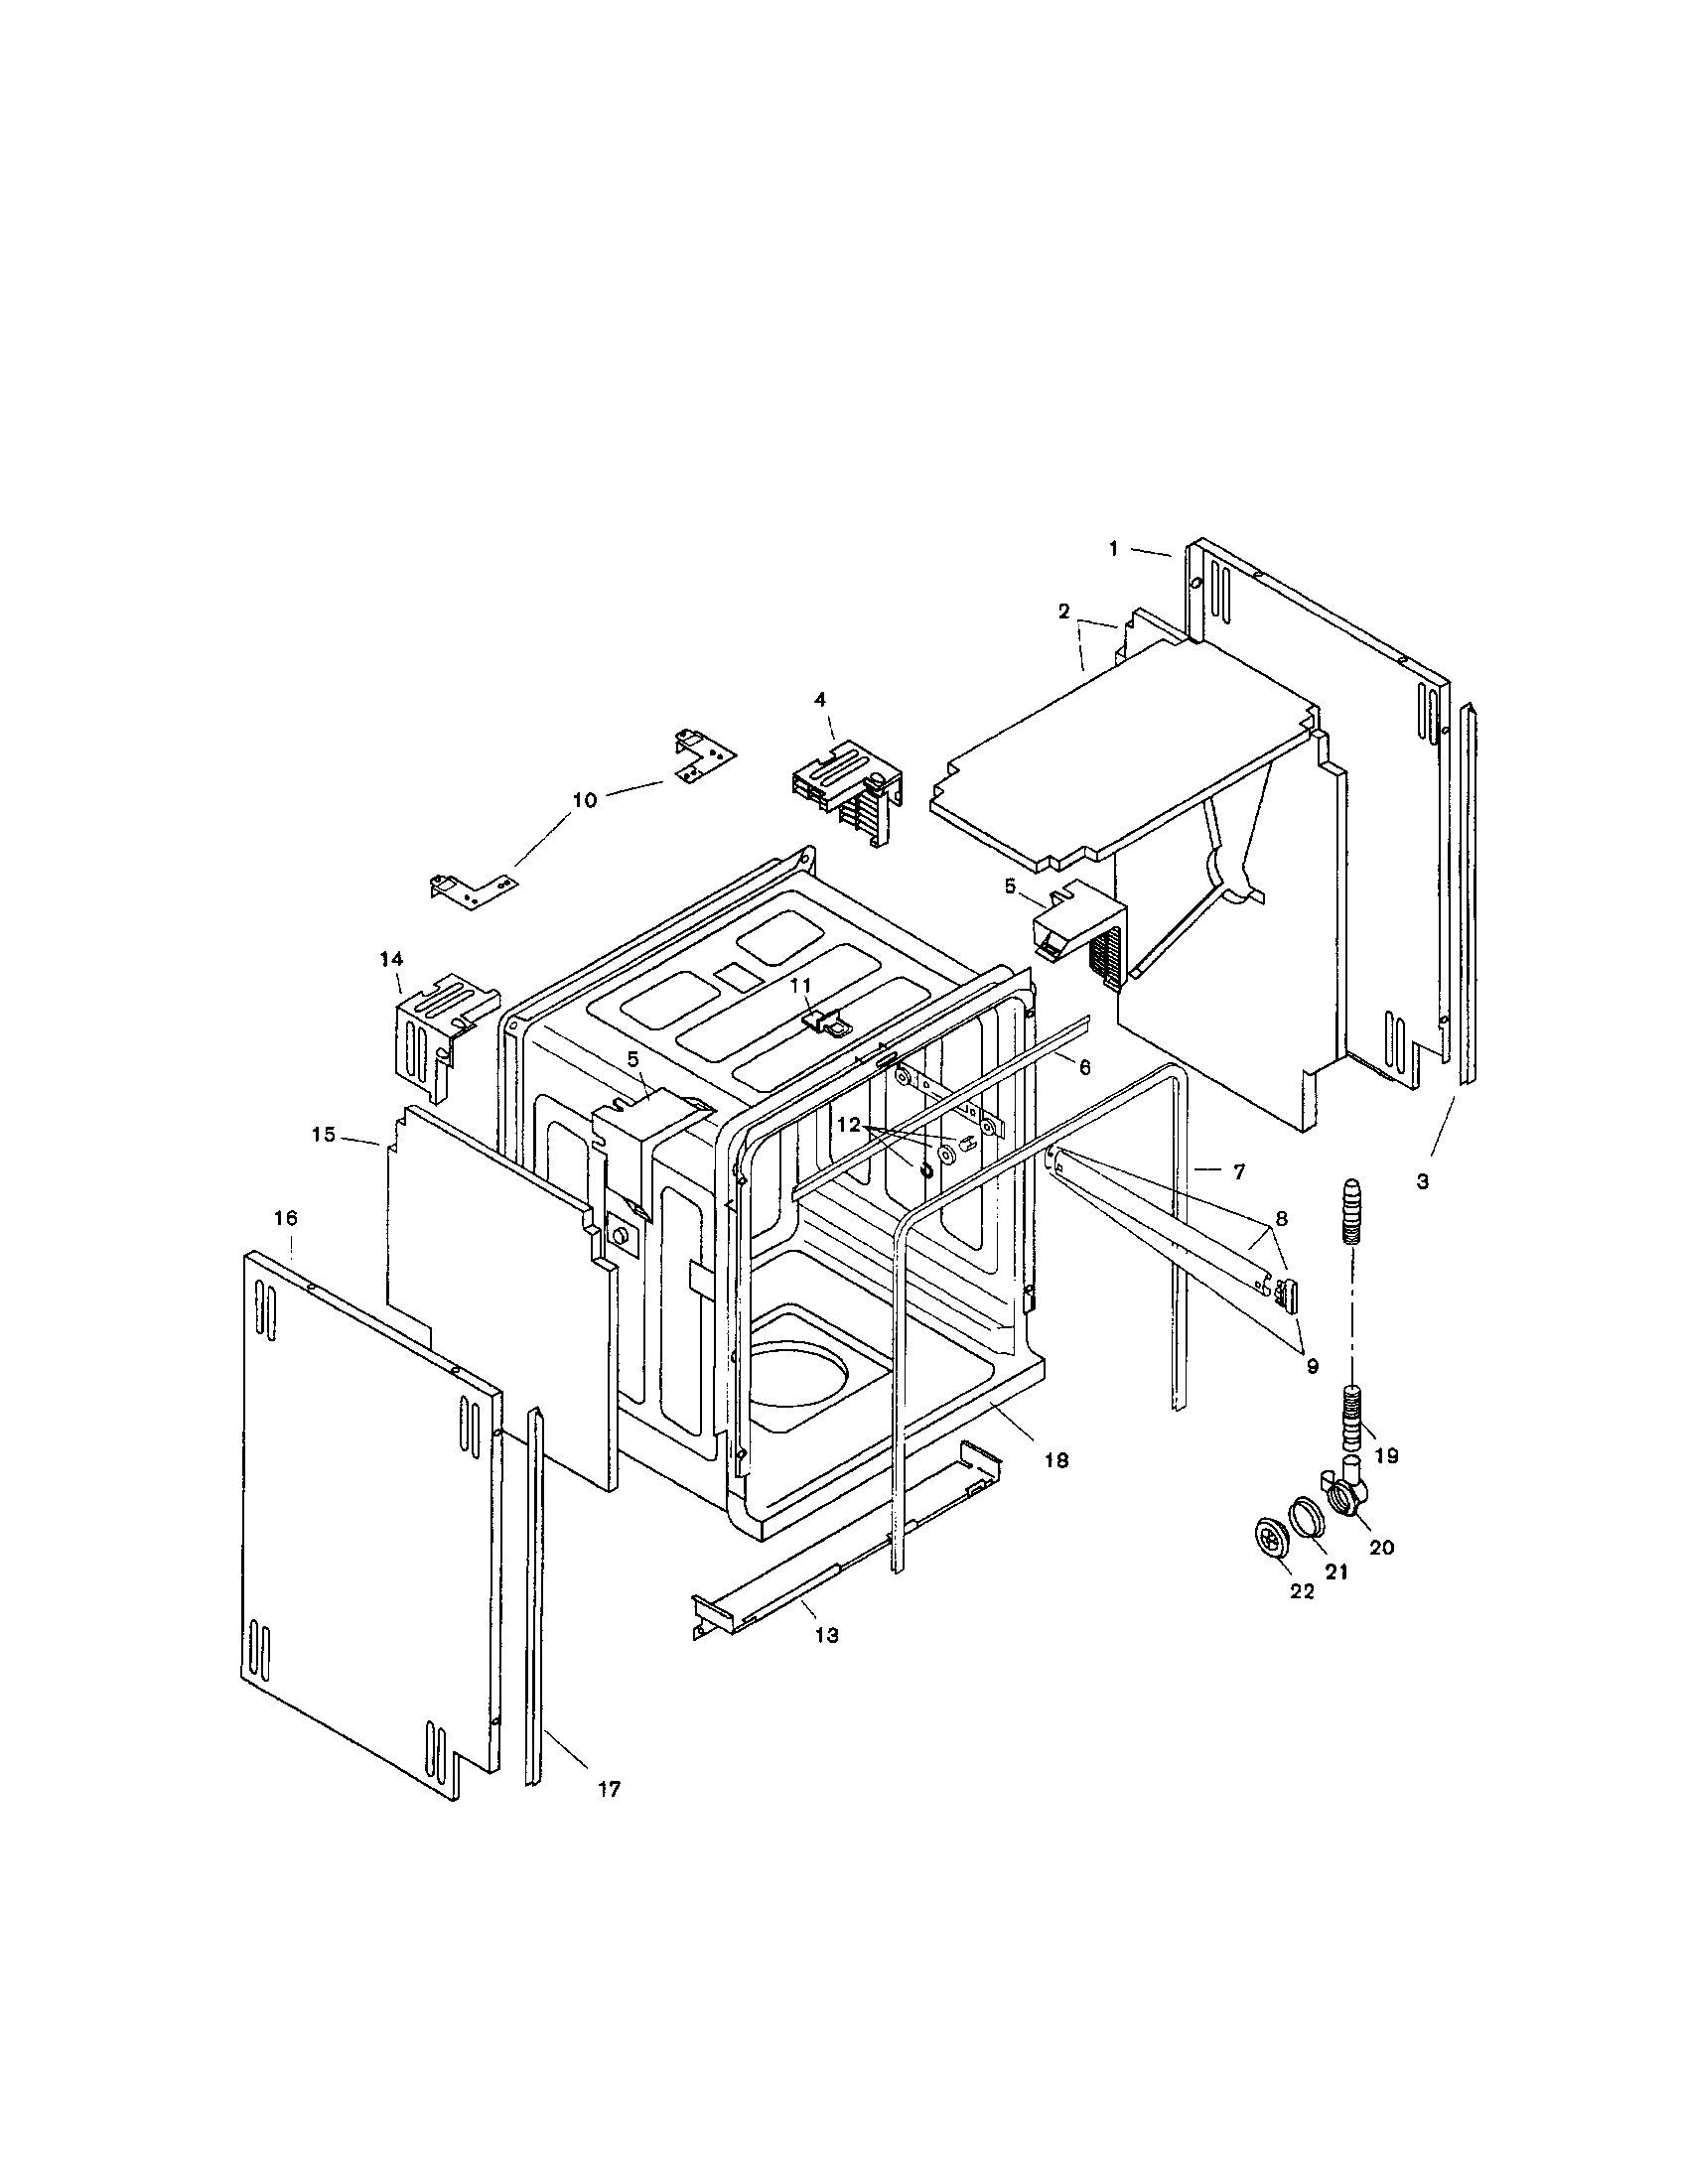 Bosch Dishwasher Model Shu5315uc12 Need Manual To Remove